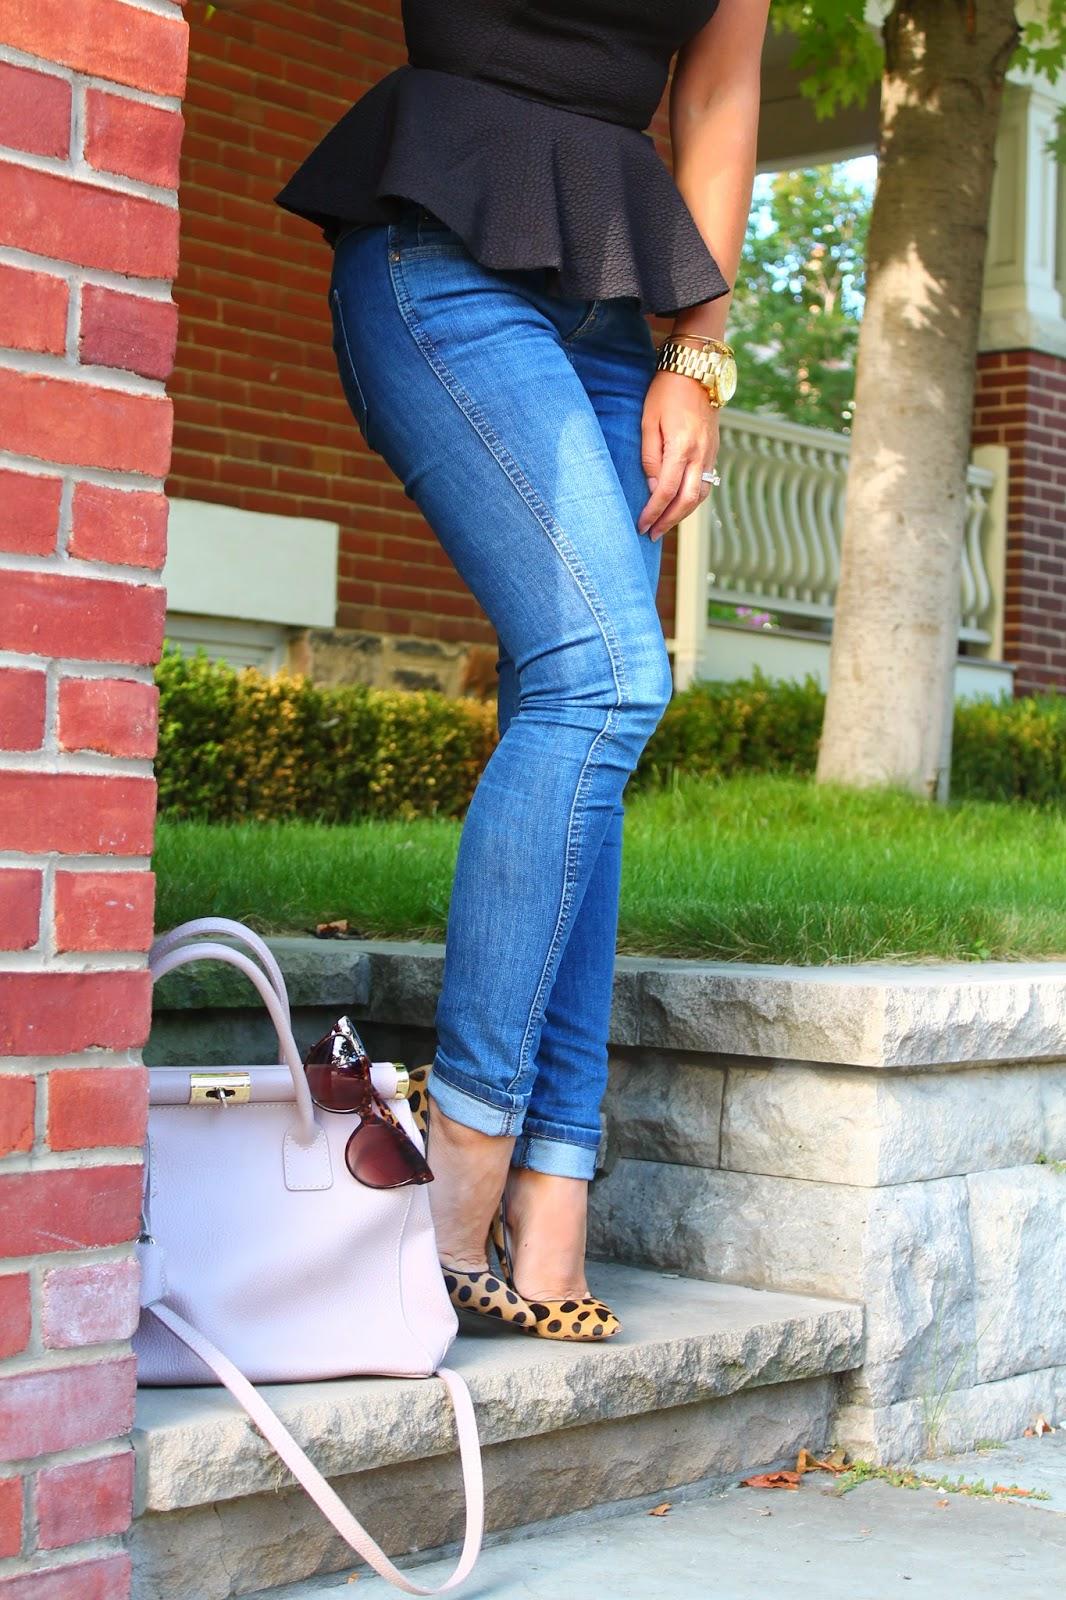 peplum, peplum top, skinny jeans and peplum top, leopard print pumps, Lauren Marinis, blogerke, cat eye sunglasses, leopard print trend, Toronto street style